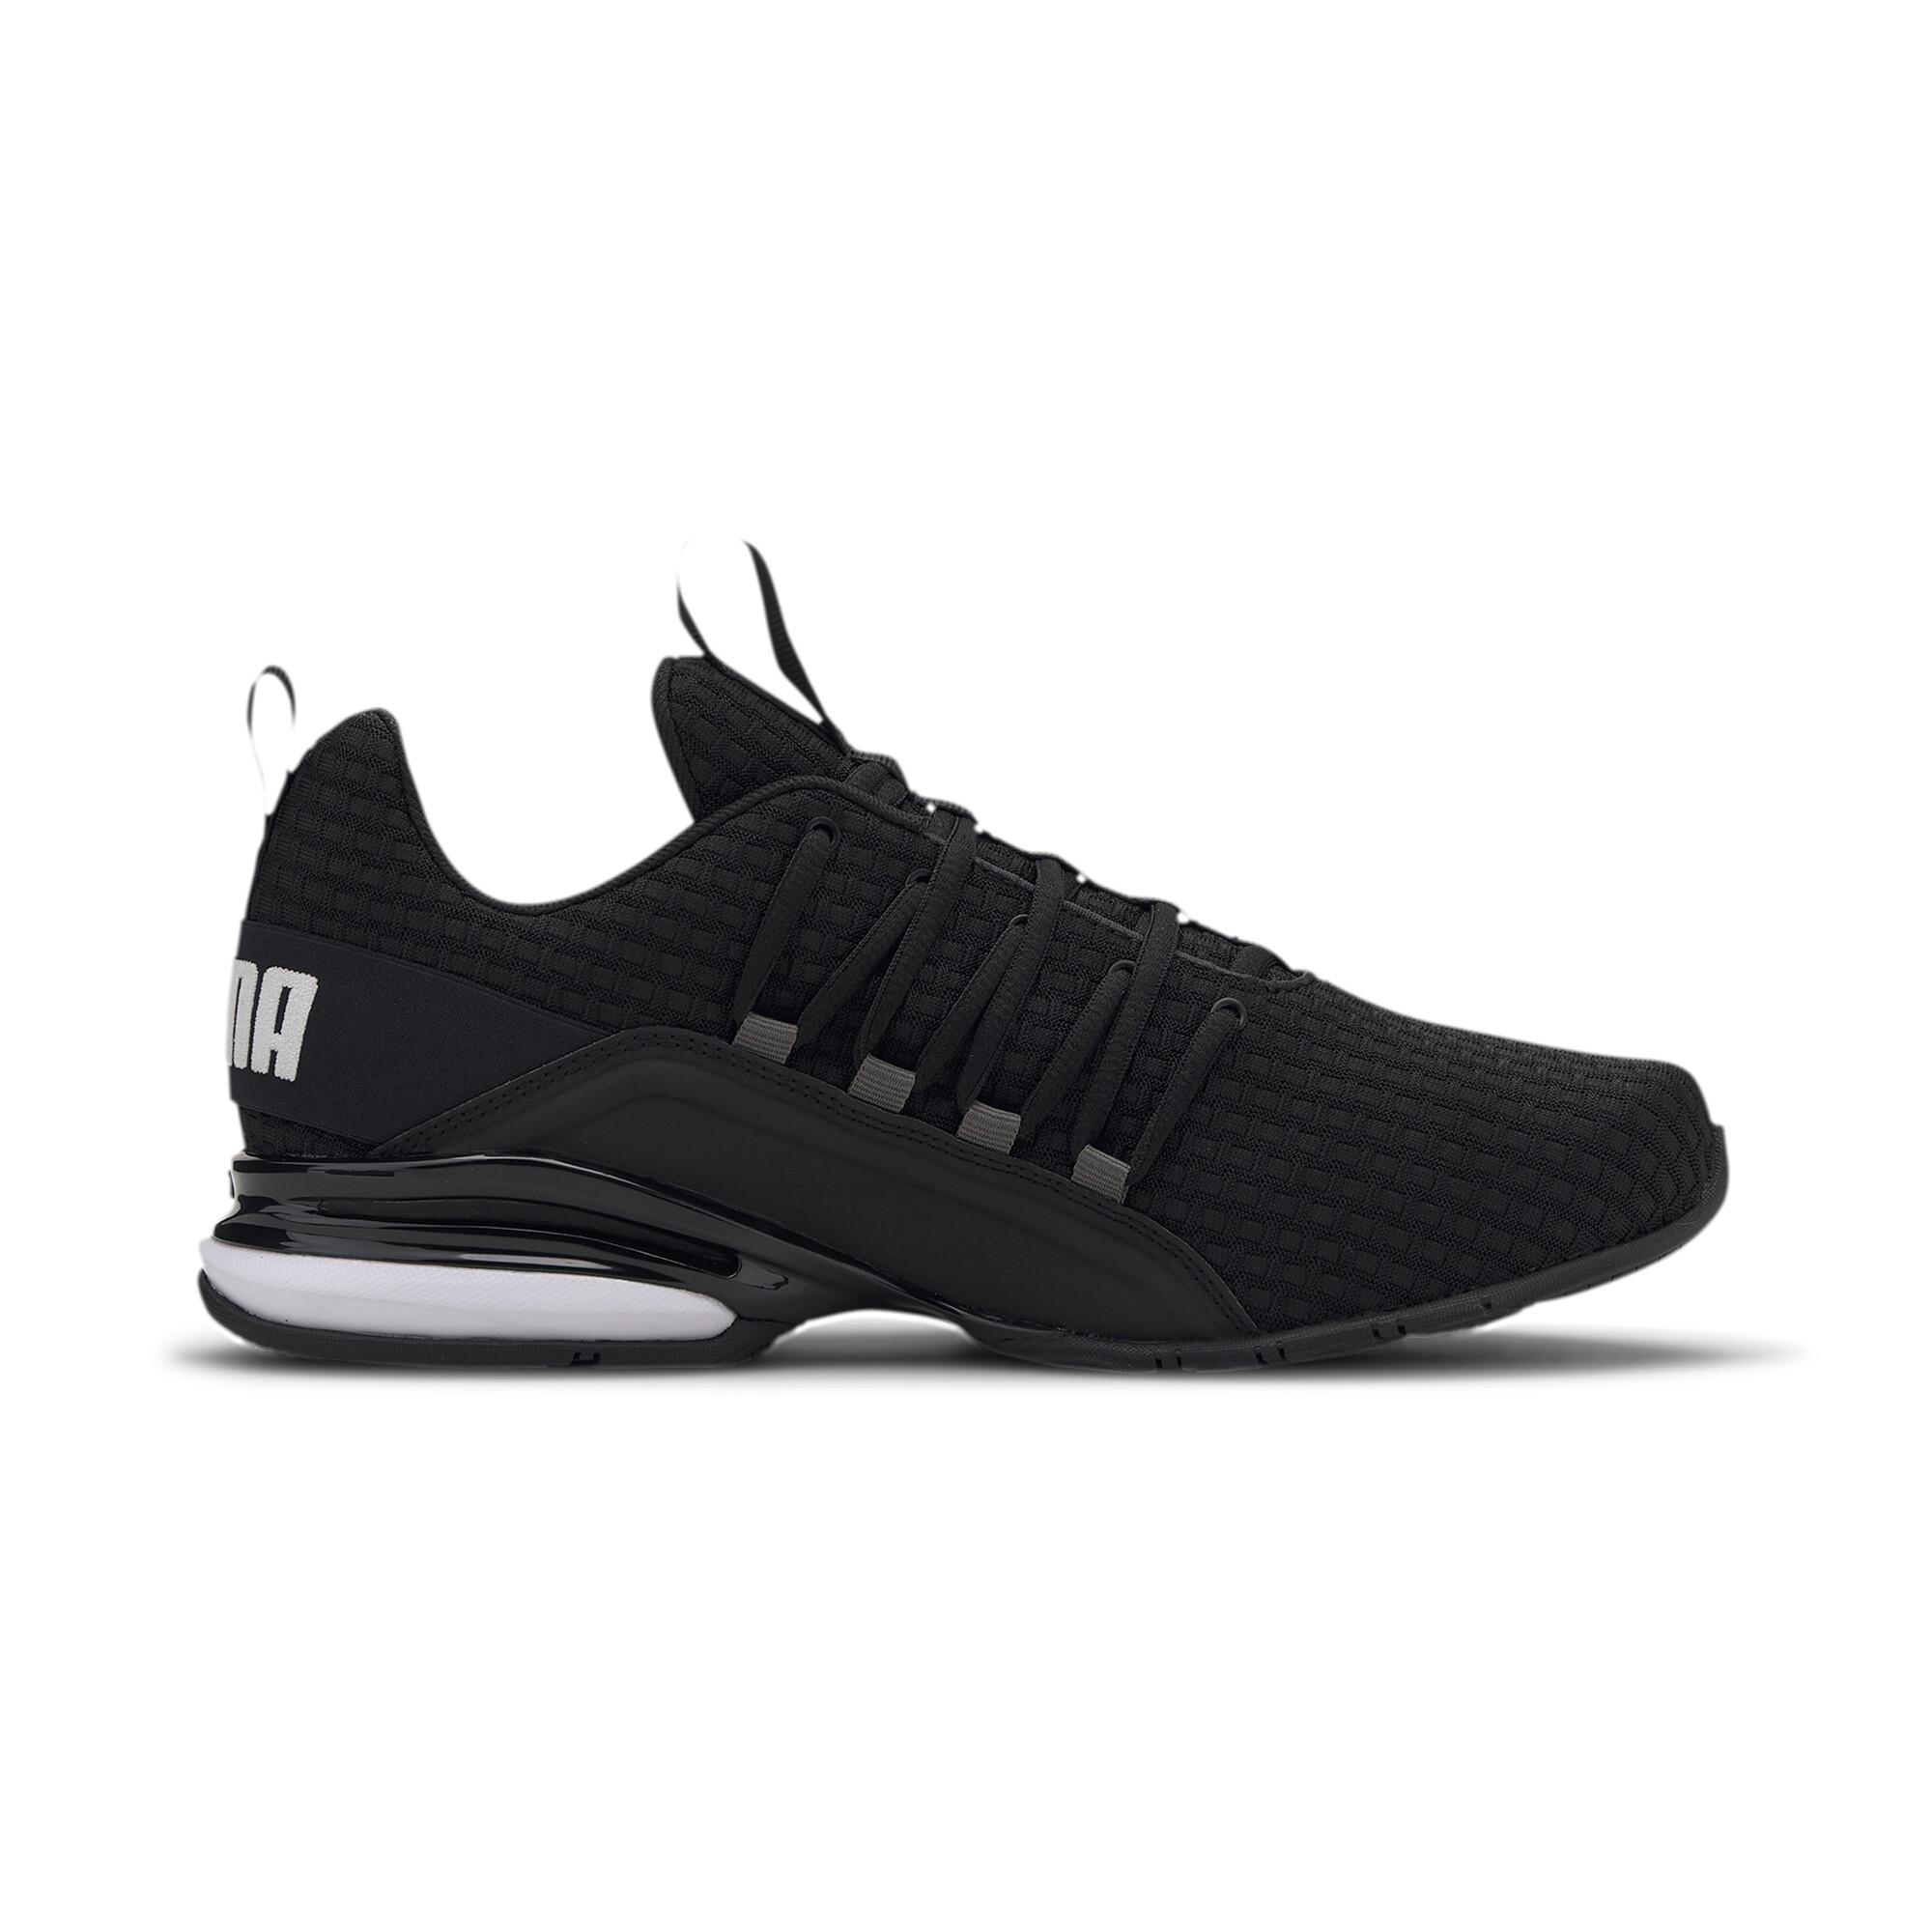 PUMA-Men-039-s-Axelion-Block-Running-Shoes thumbnail 21